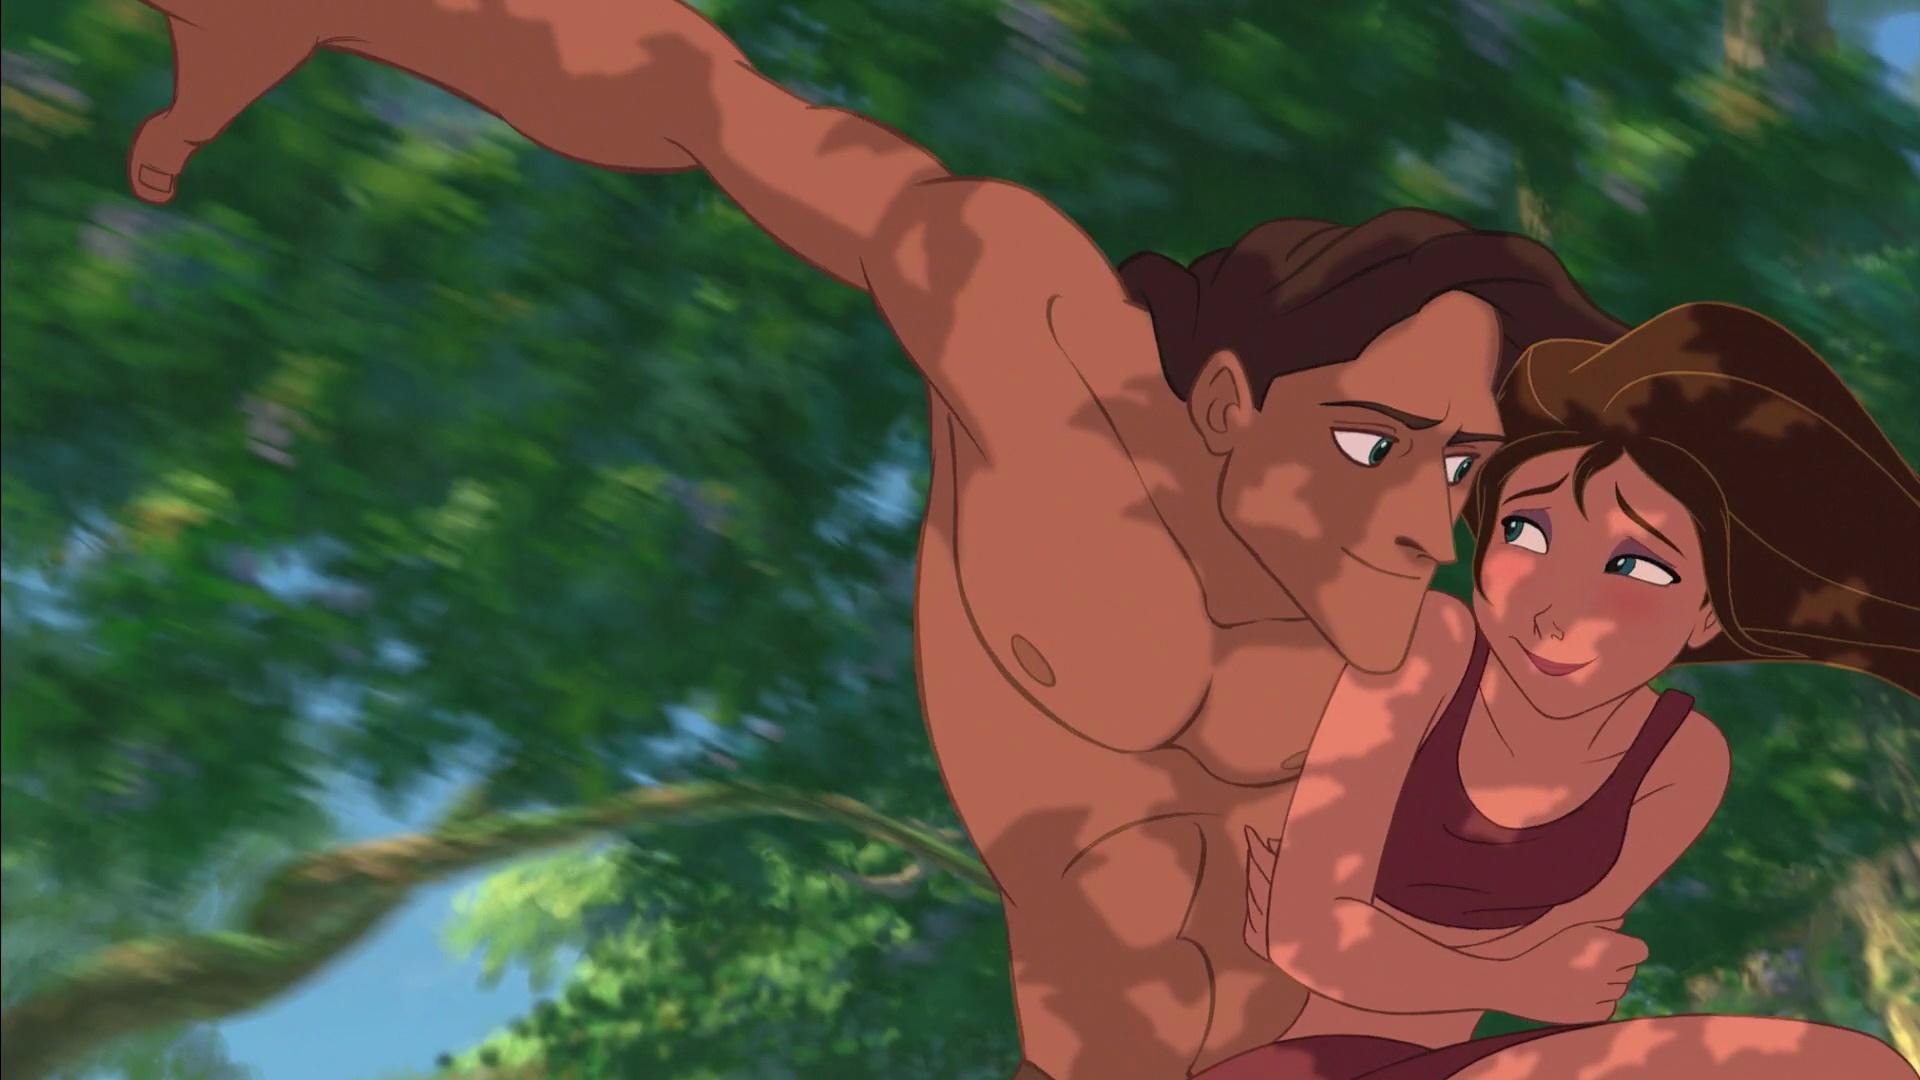 Tarzan Backgrounds on Wallpapers Vista